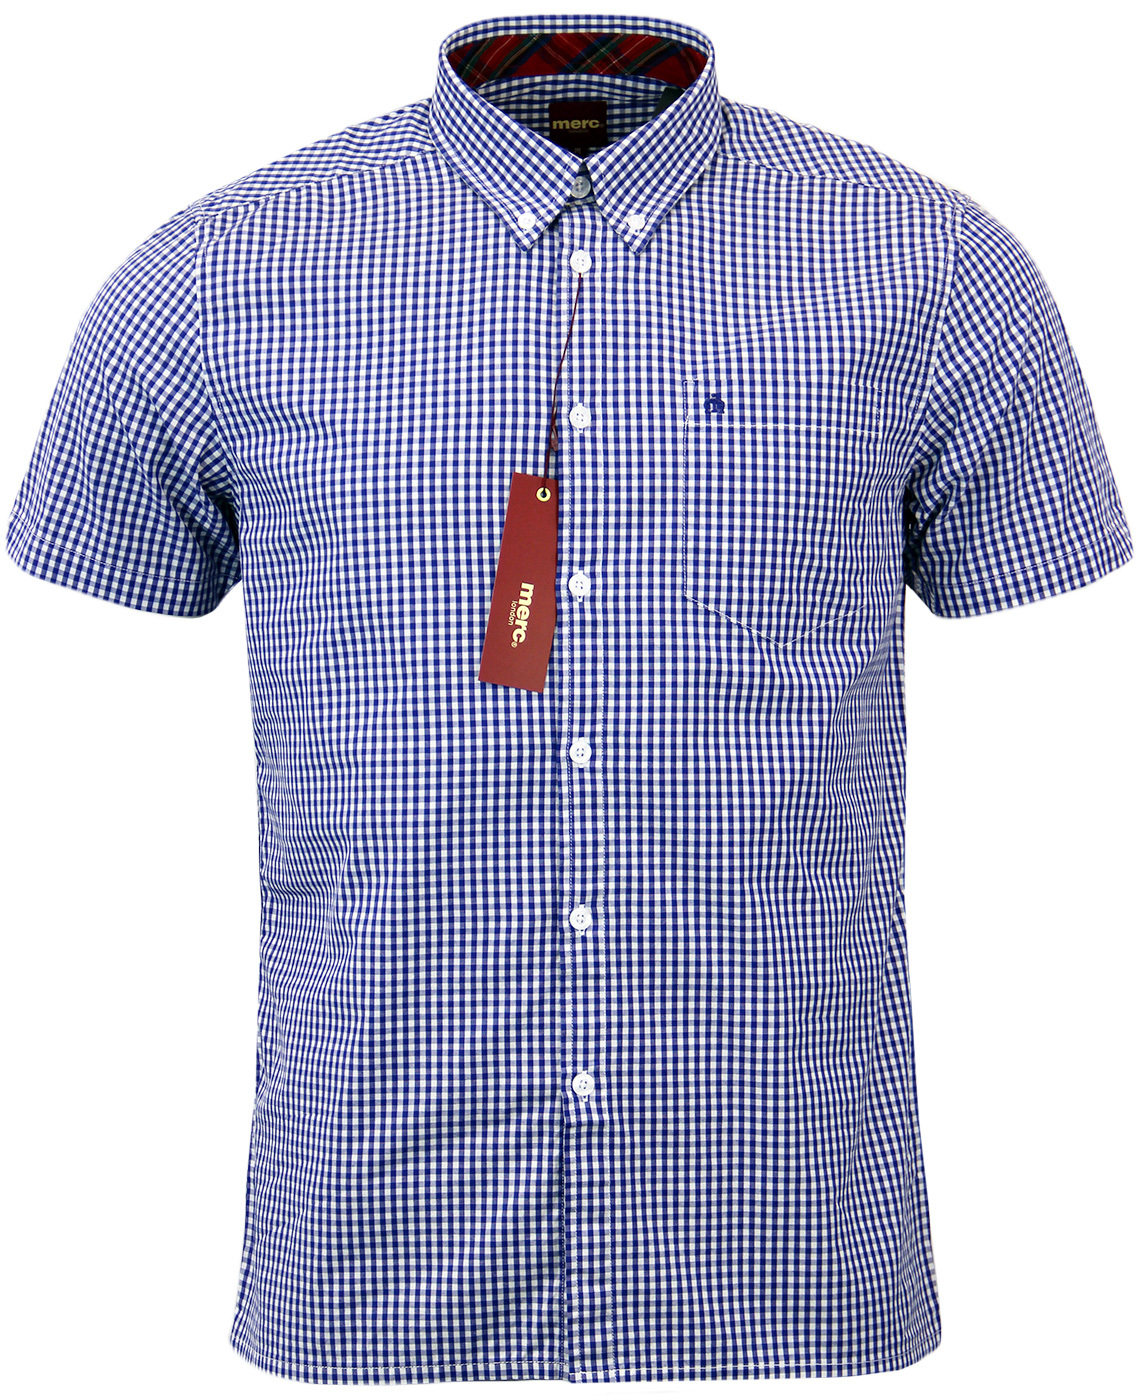 Terry MERC Retro Mod Classic Gingham Shirt (R)